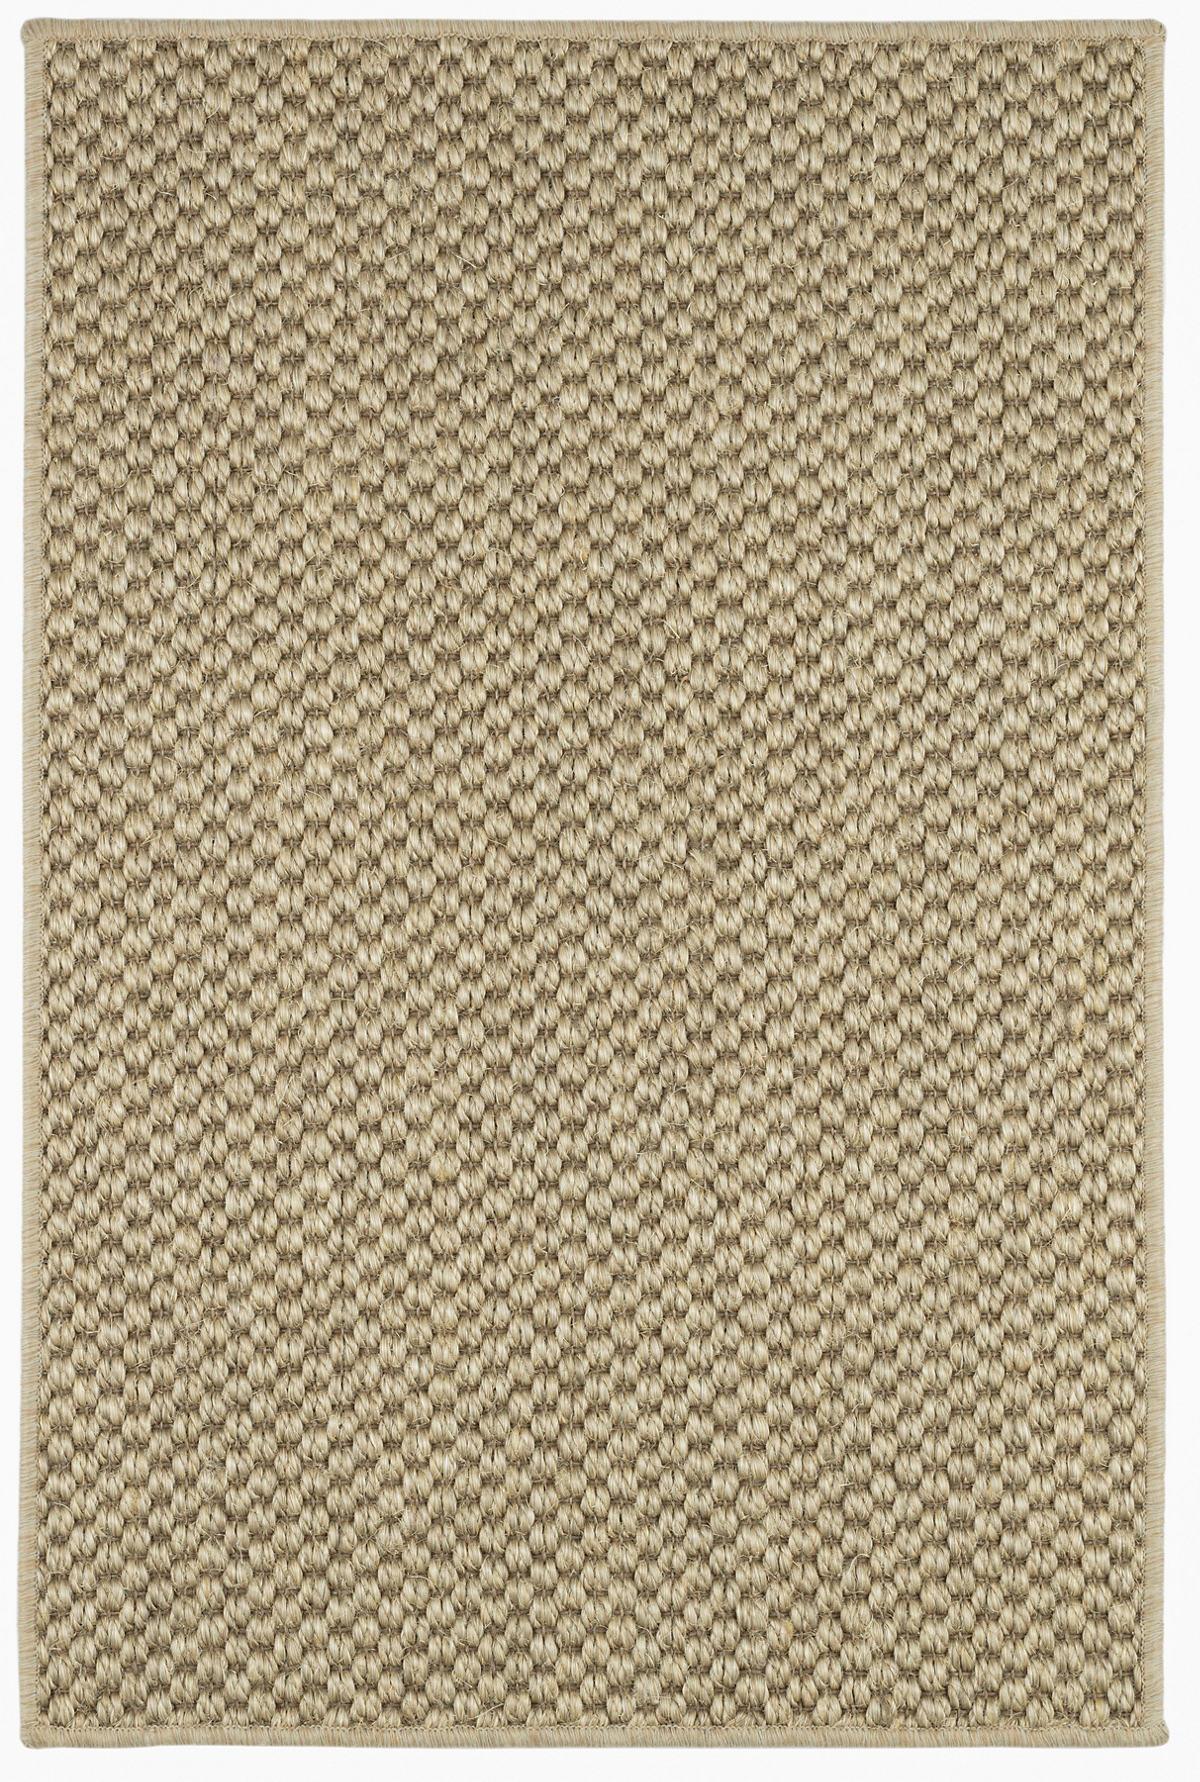 Corden Honey Woven Sisal Custom Rug With Pad